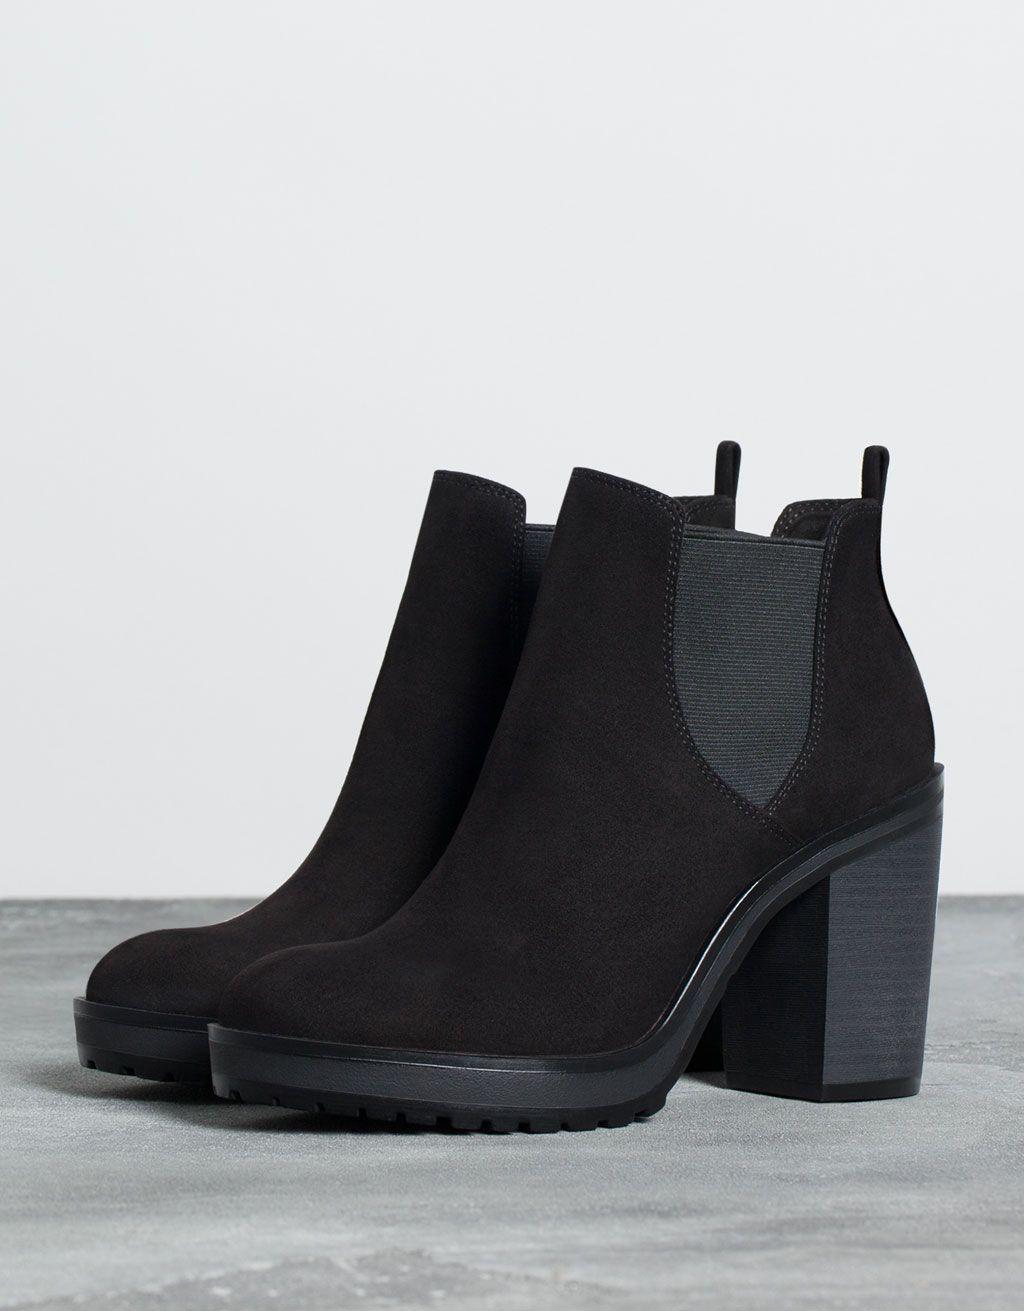 348215a060aa Stivaletto Bershka con tacco e fascia elastica - Nero. Bottines Bershka,  Chaussures Compensées,